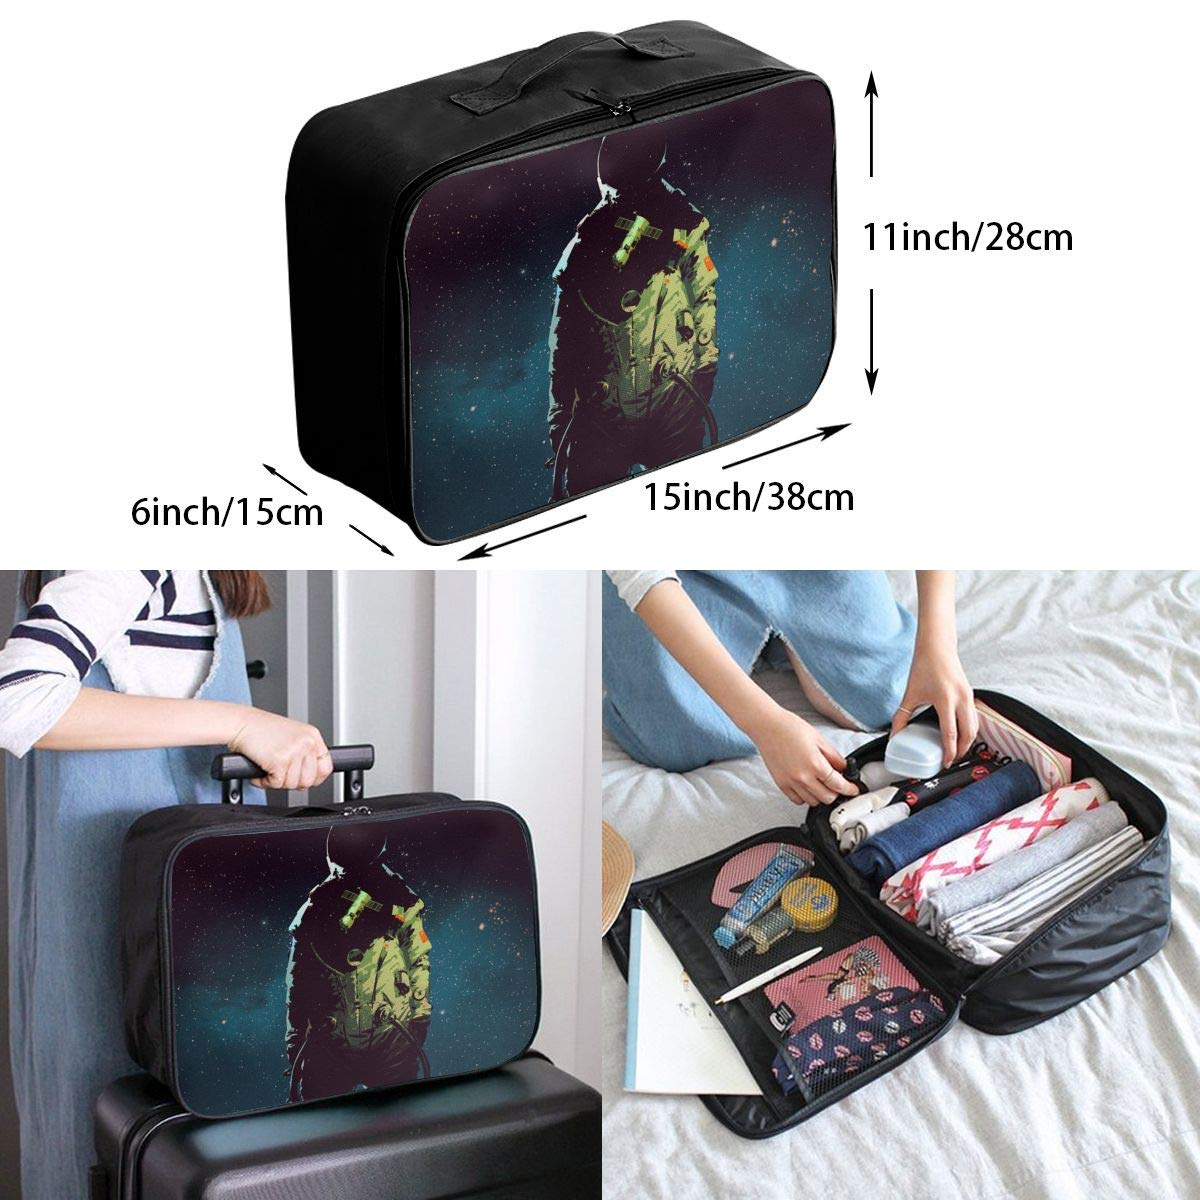 Travel Luggage Duffle Bag Lightweight Portable Handbag Astronaut Print Large Capacity Waterproof Foldable Storage Tote